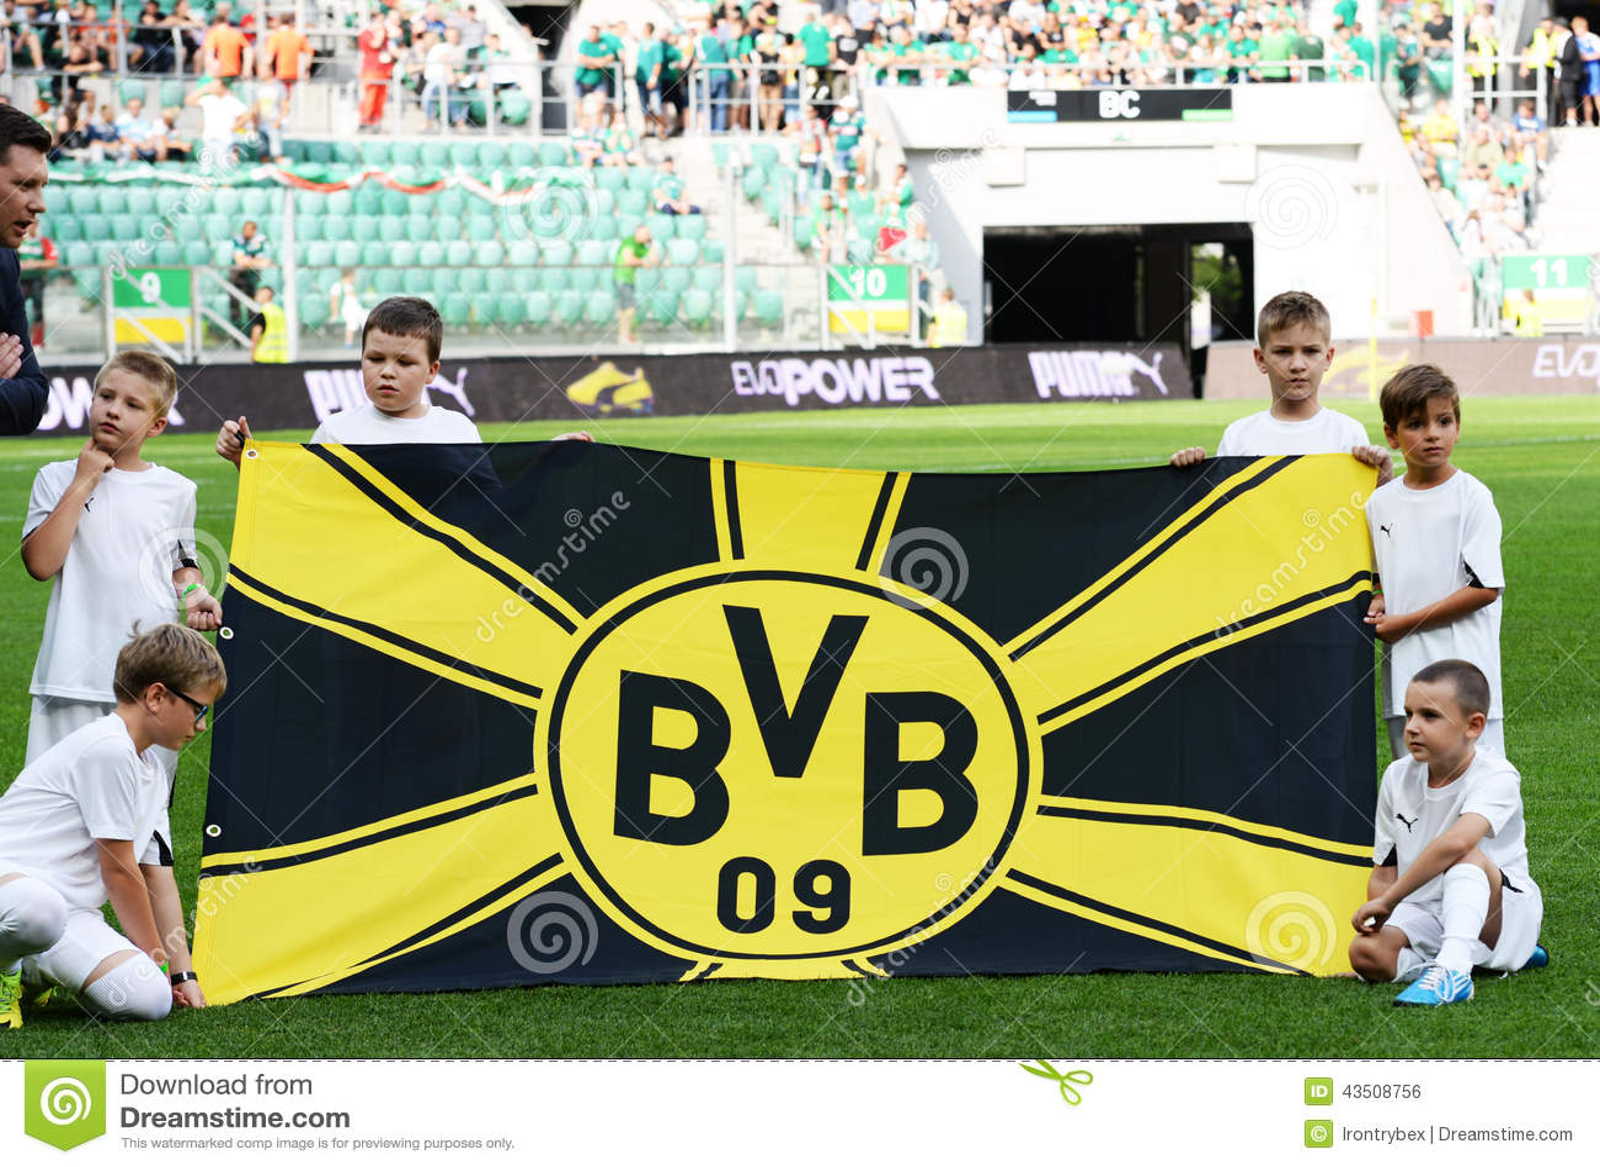 Borussia Dortmund Bvb Flag Editorial Photo Image Of Flag 2014 43508756